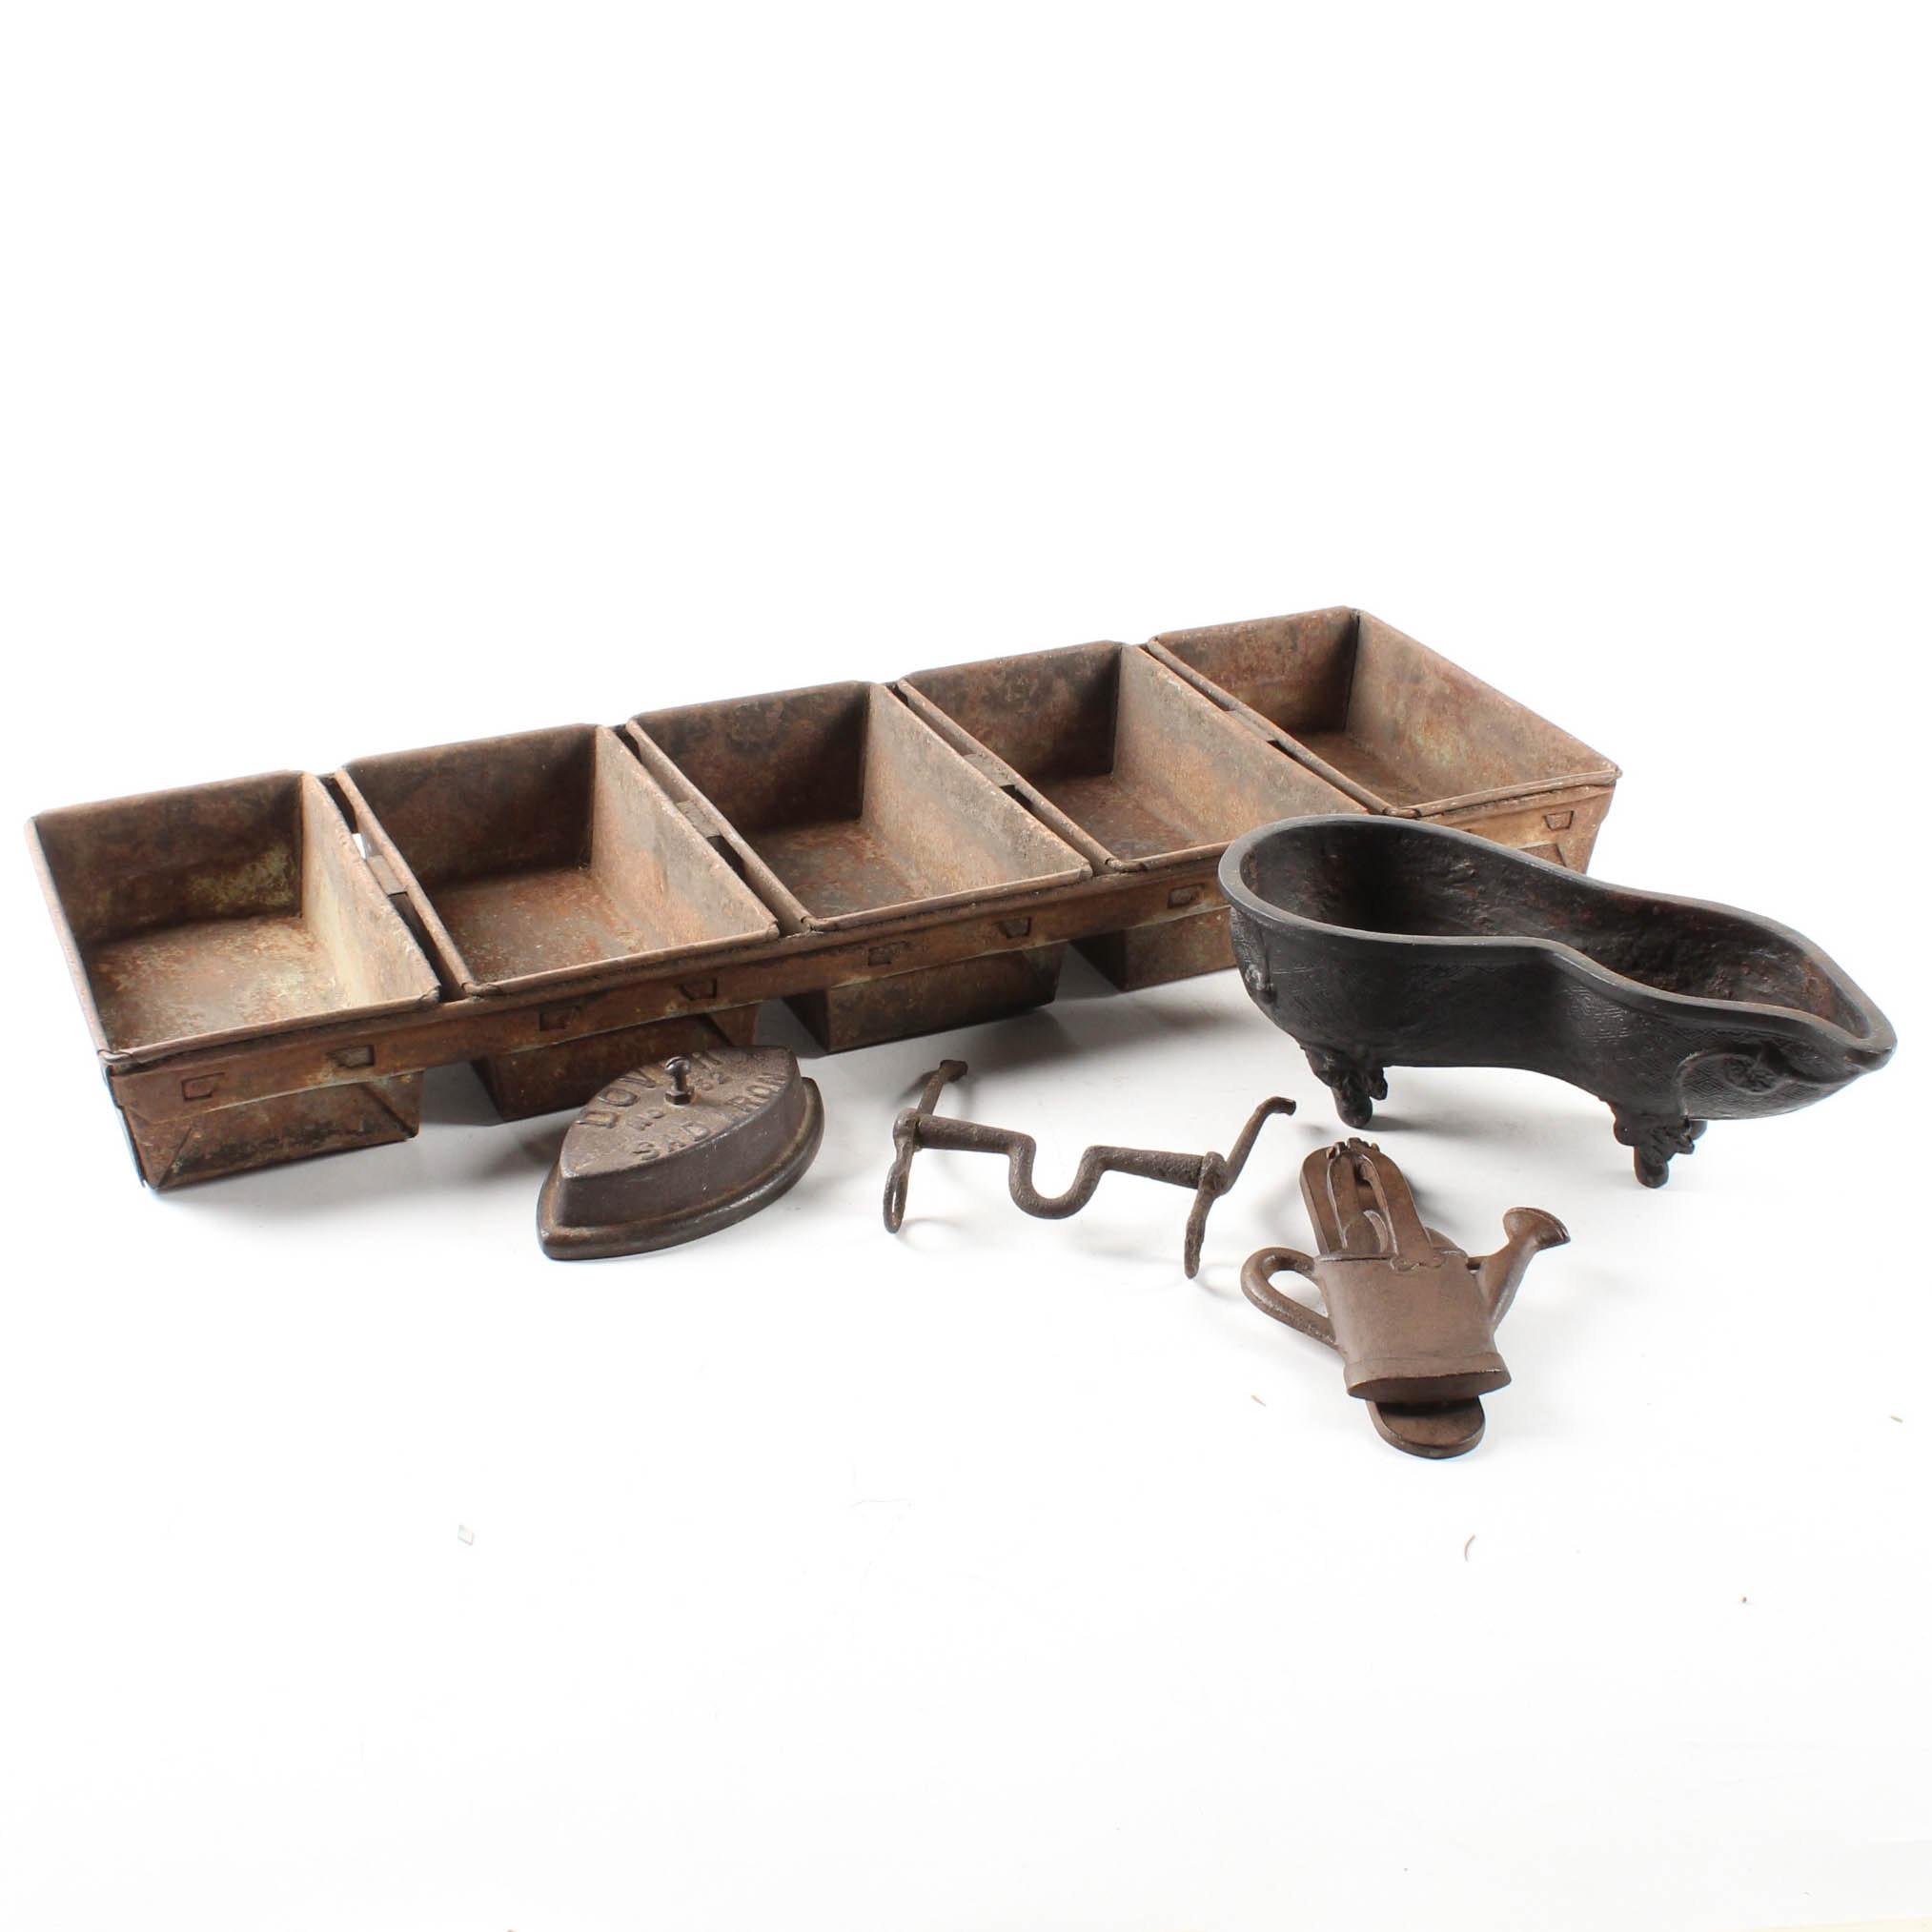 Vintage Cast Iron and Metal Primitives